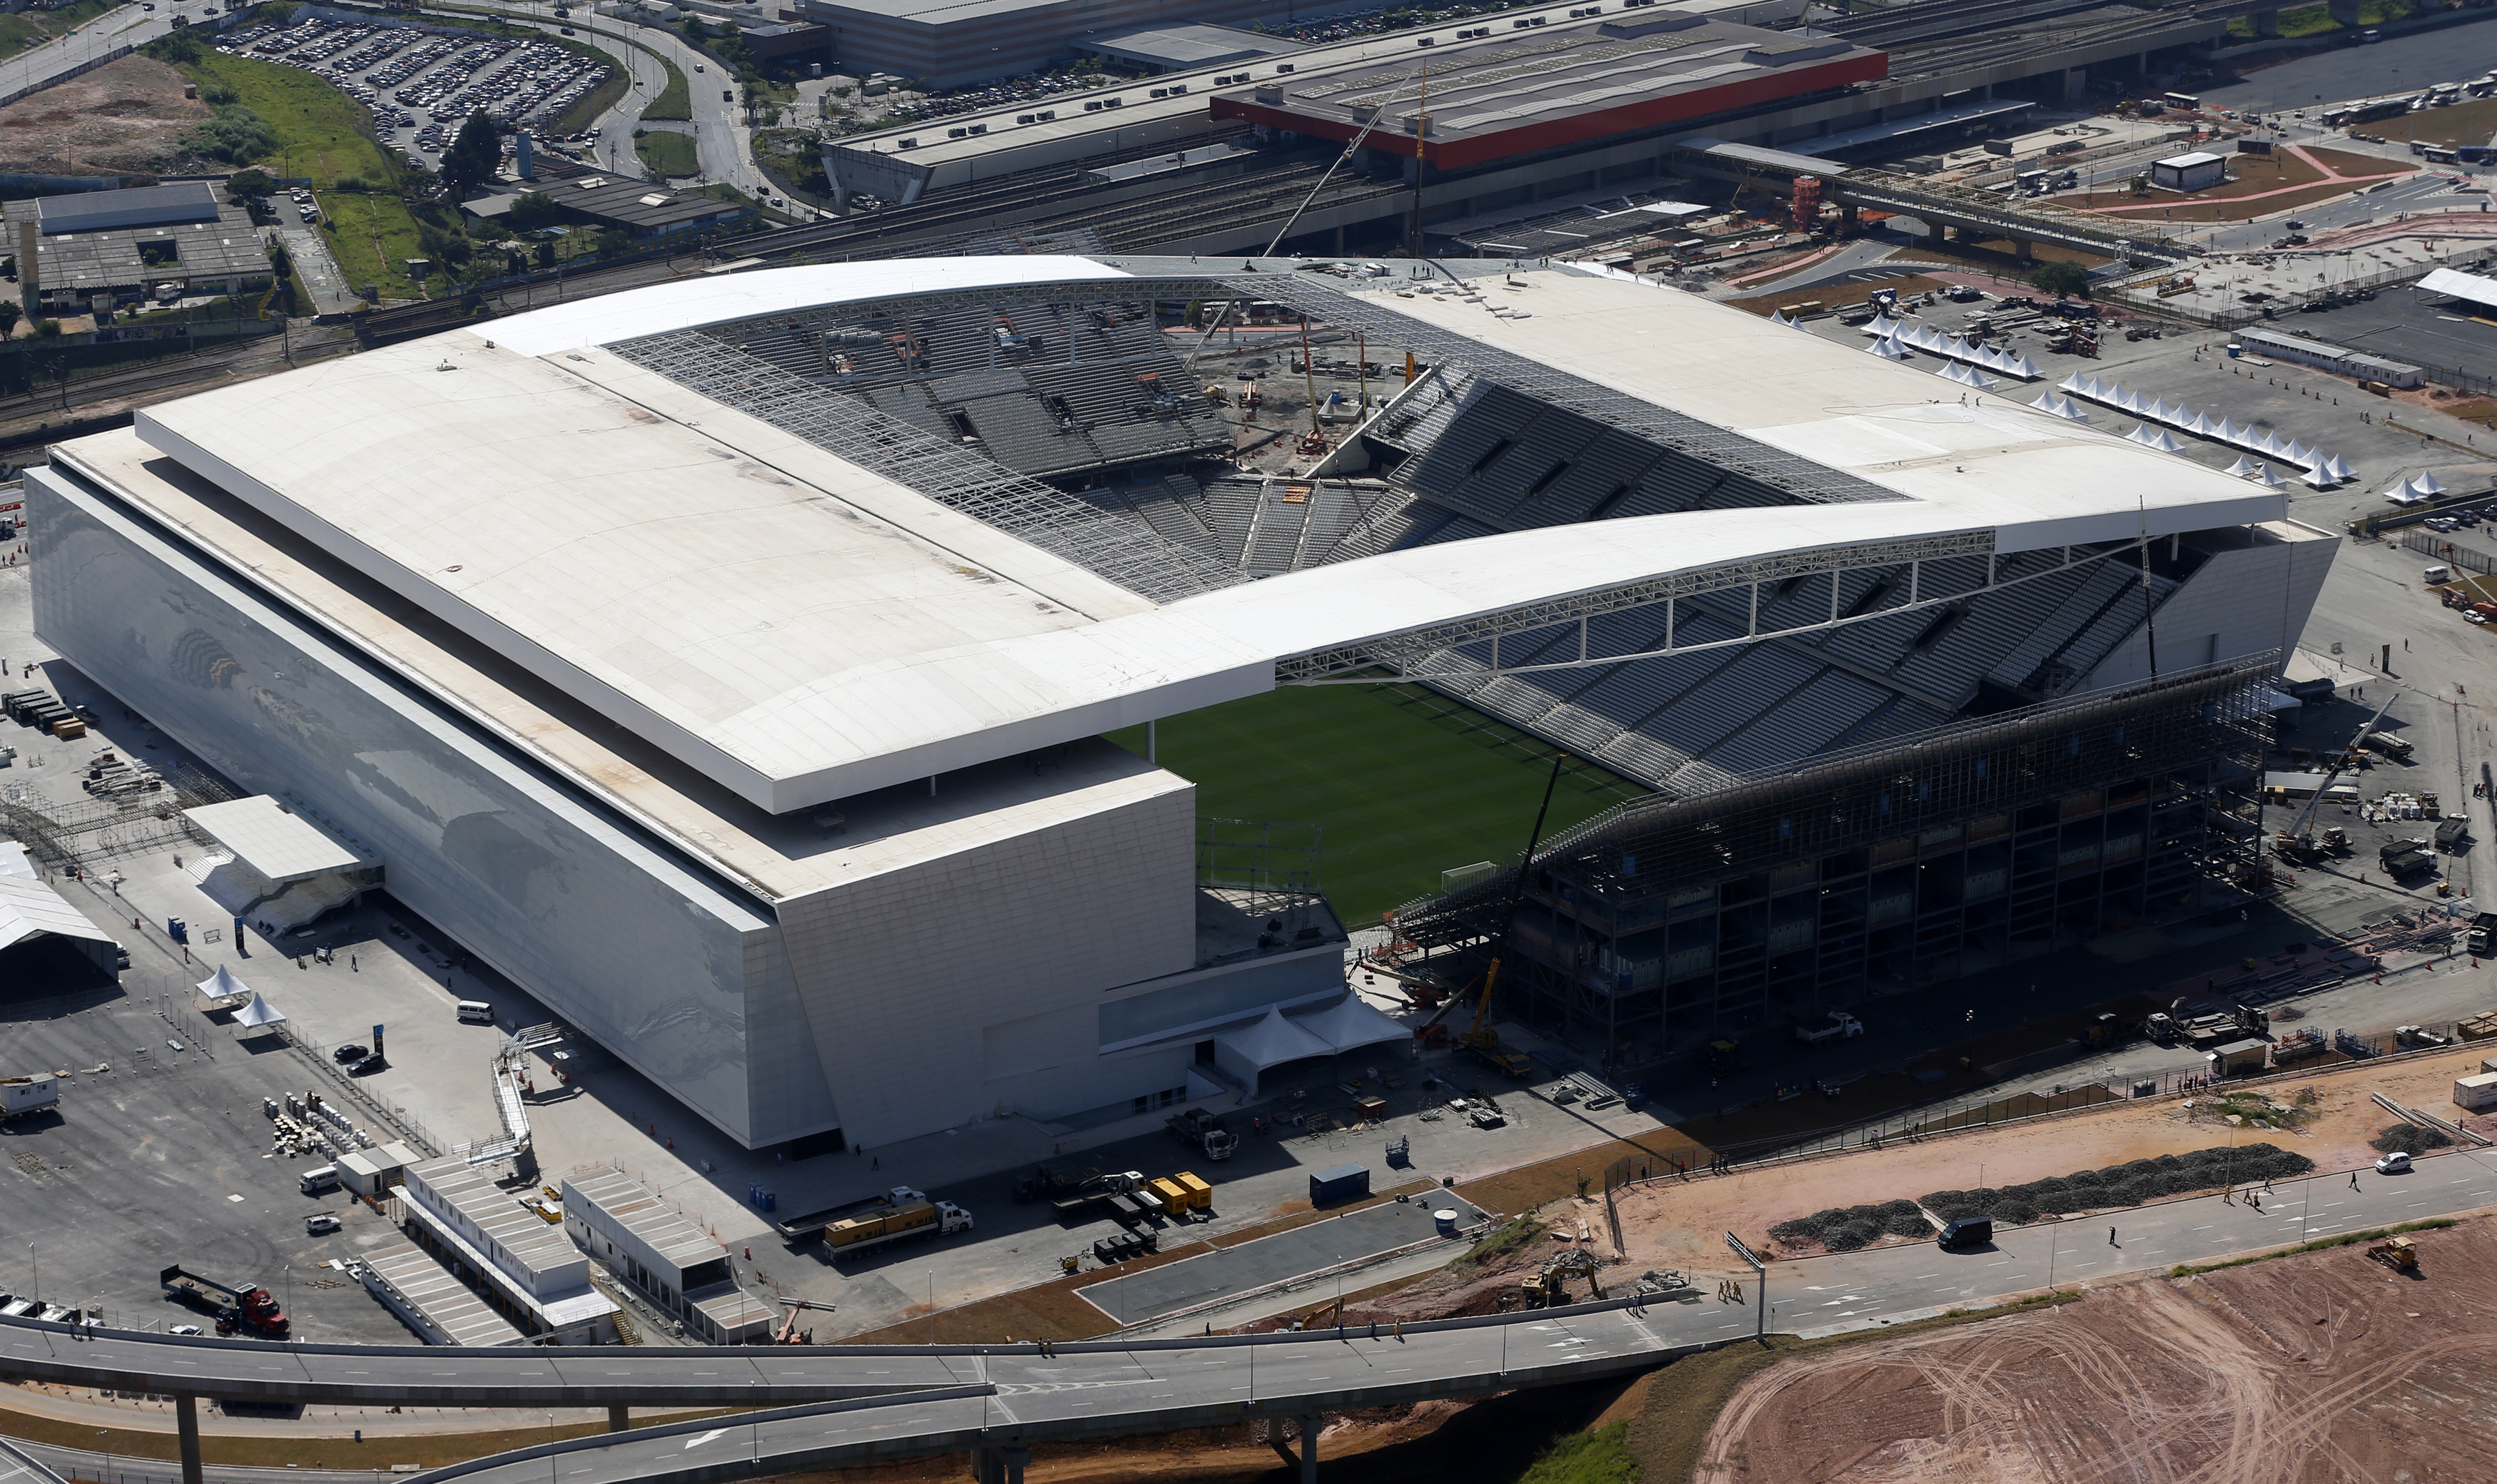 Arena de Sao Paulo                                                              City: Sao Paulo                                                              Constructed: 2014                                                              Capacity: 61,600